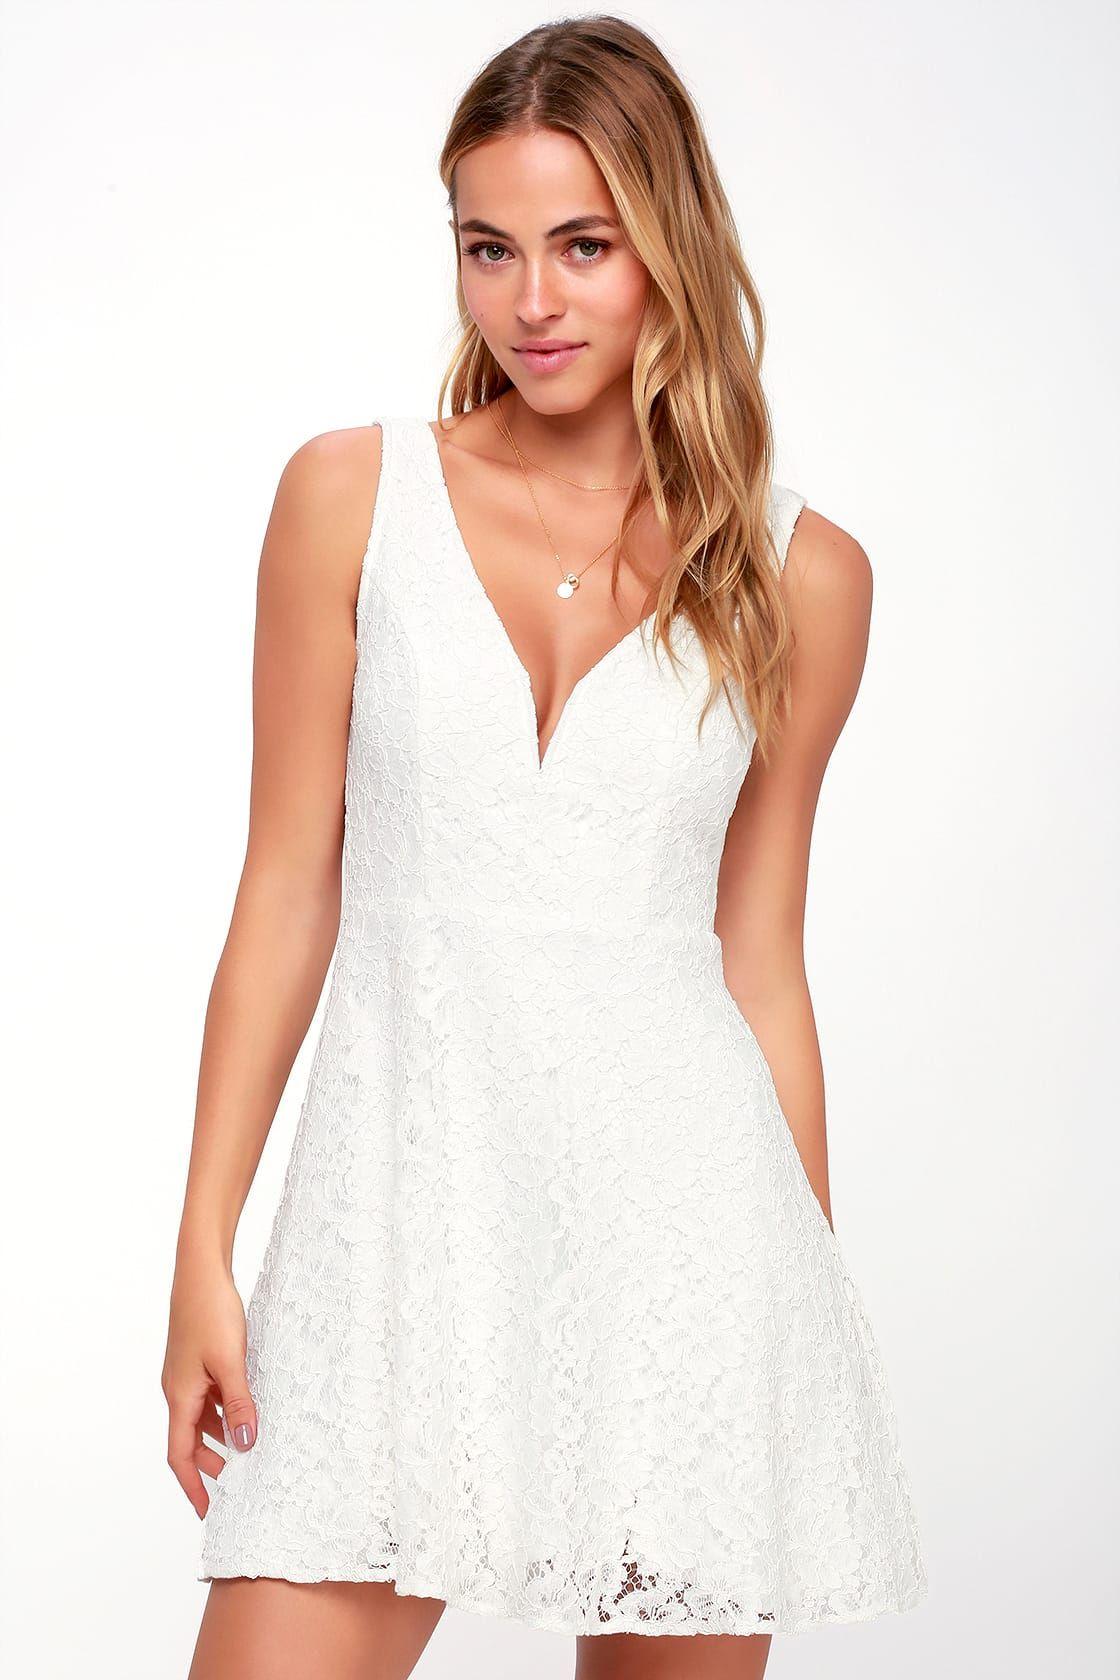 Declaring My Love White Lace Skater Dress White Lace Skater Dress Little White Dresses White Short Dress [ 1680 x 1120 Pixel ]